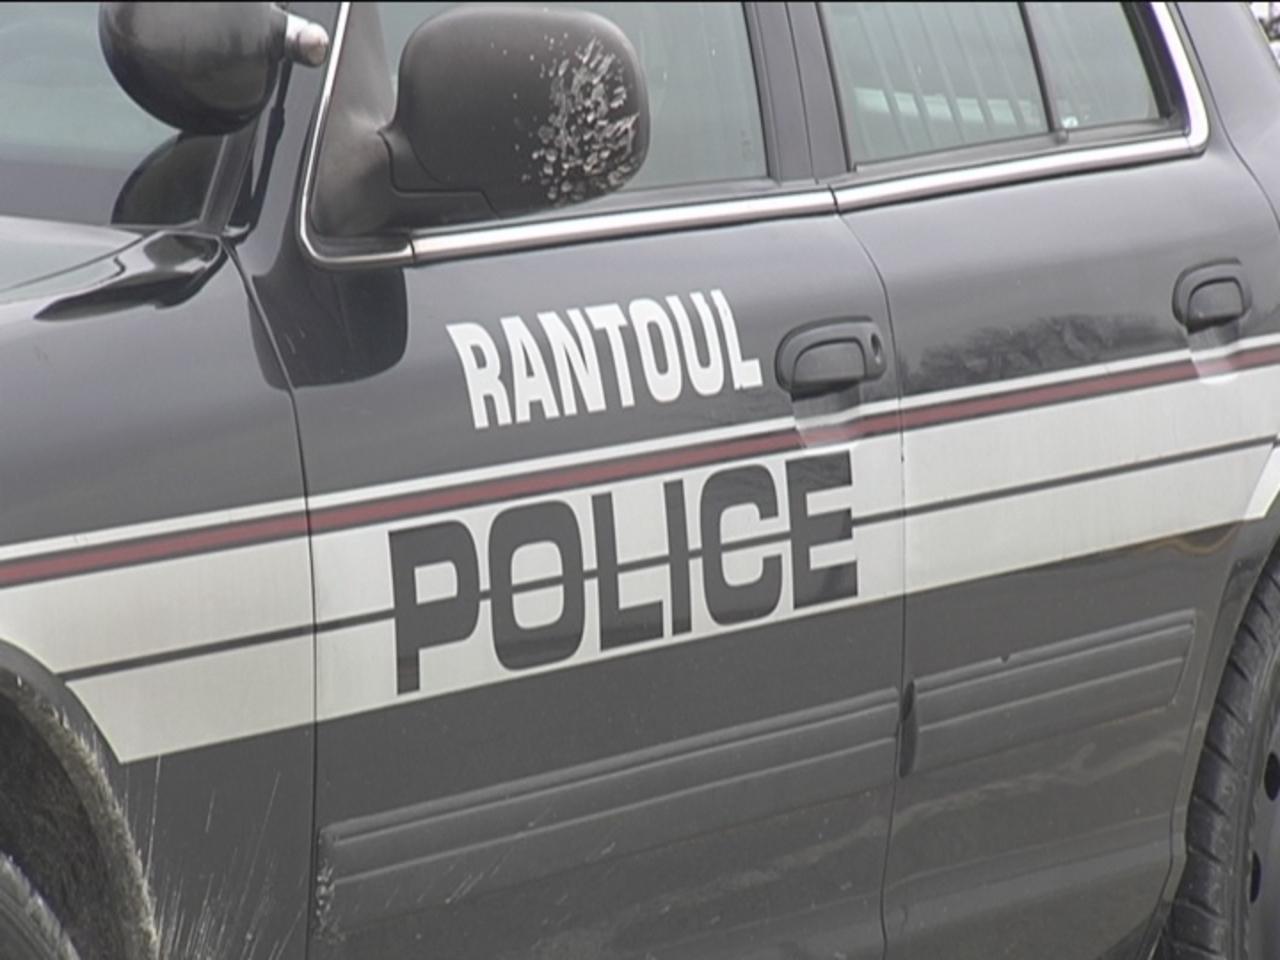 RANTOUL police